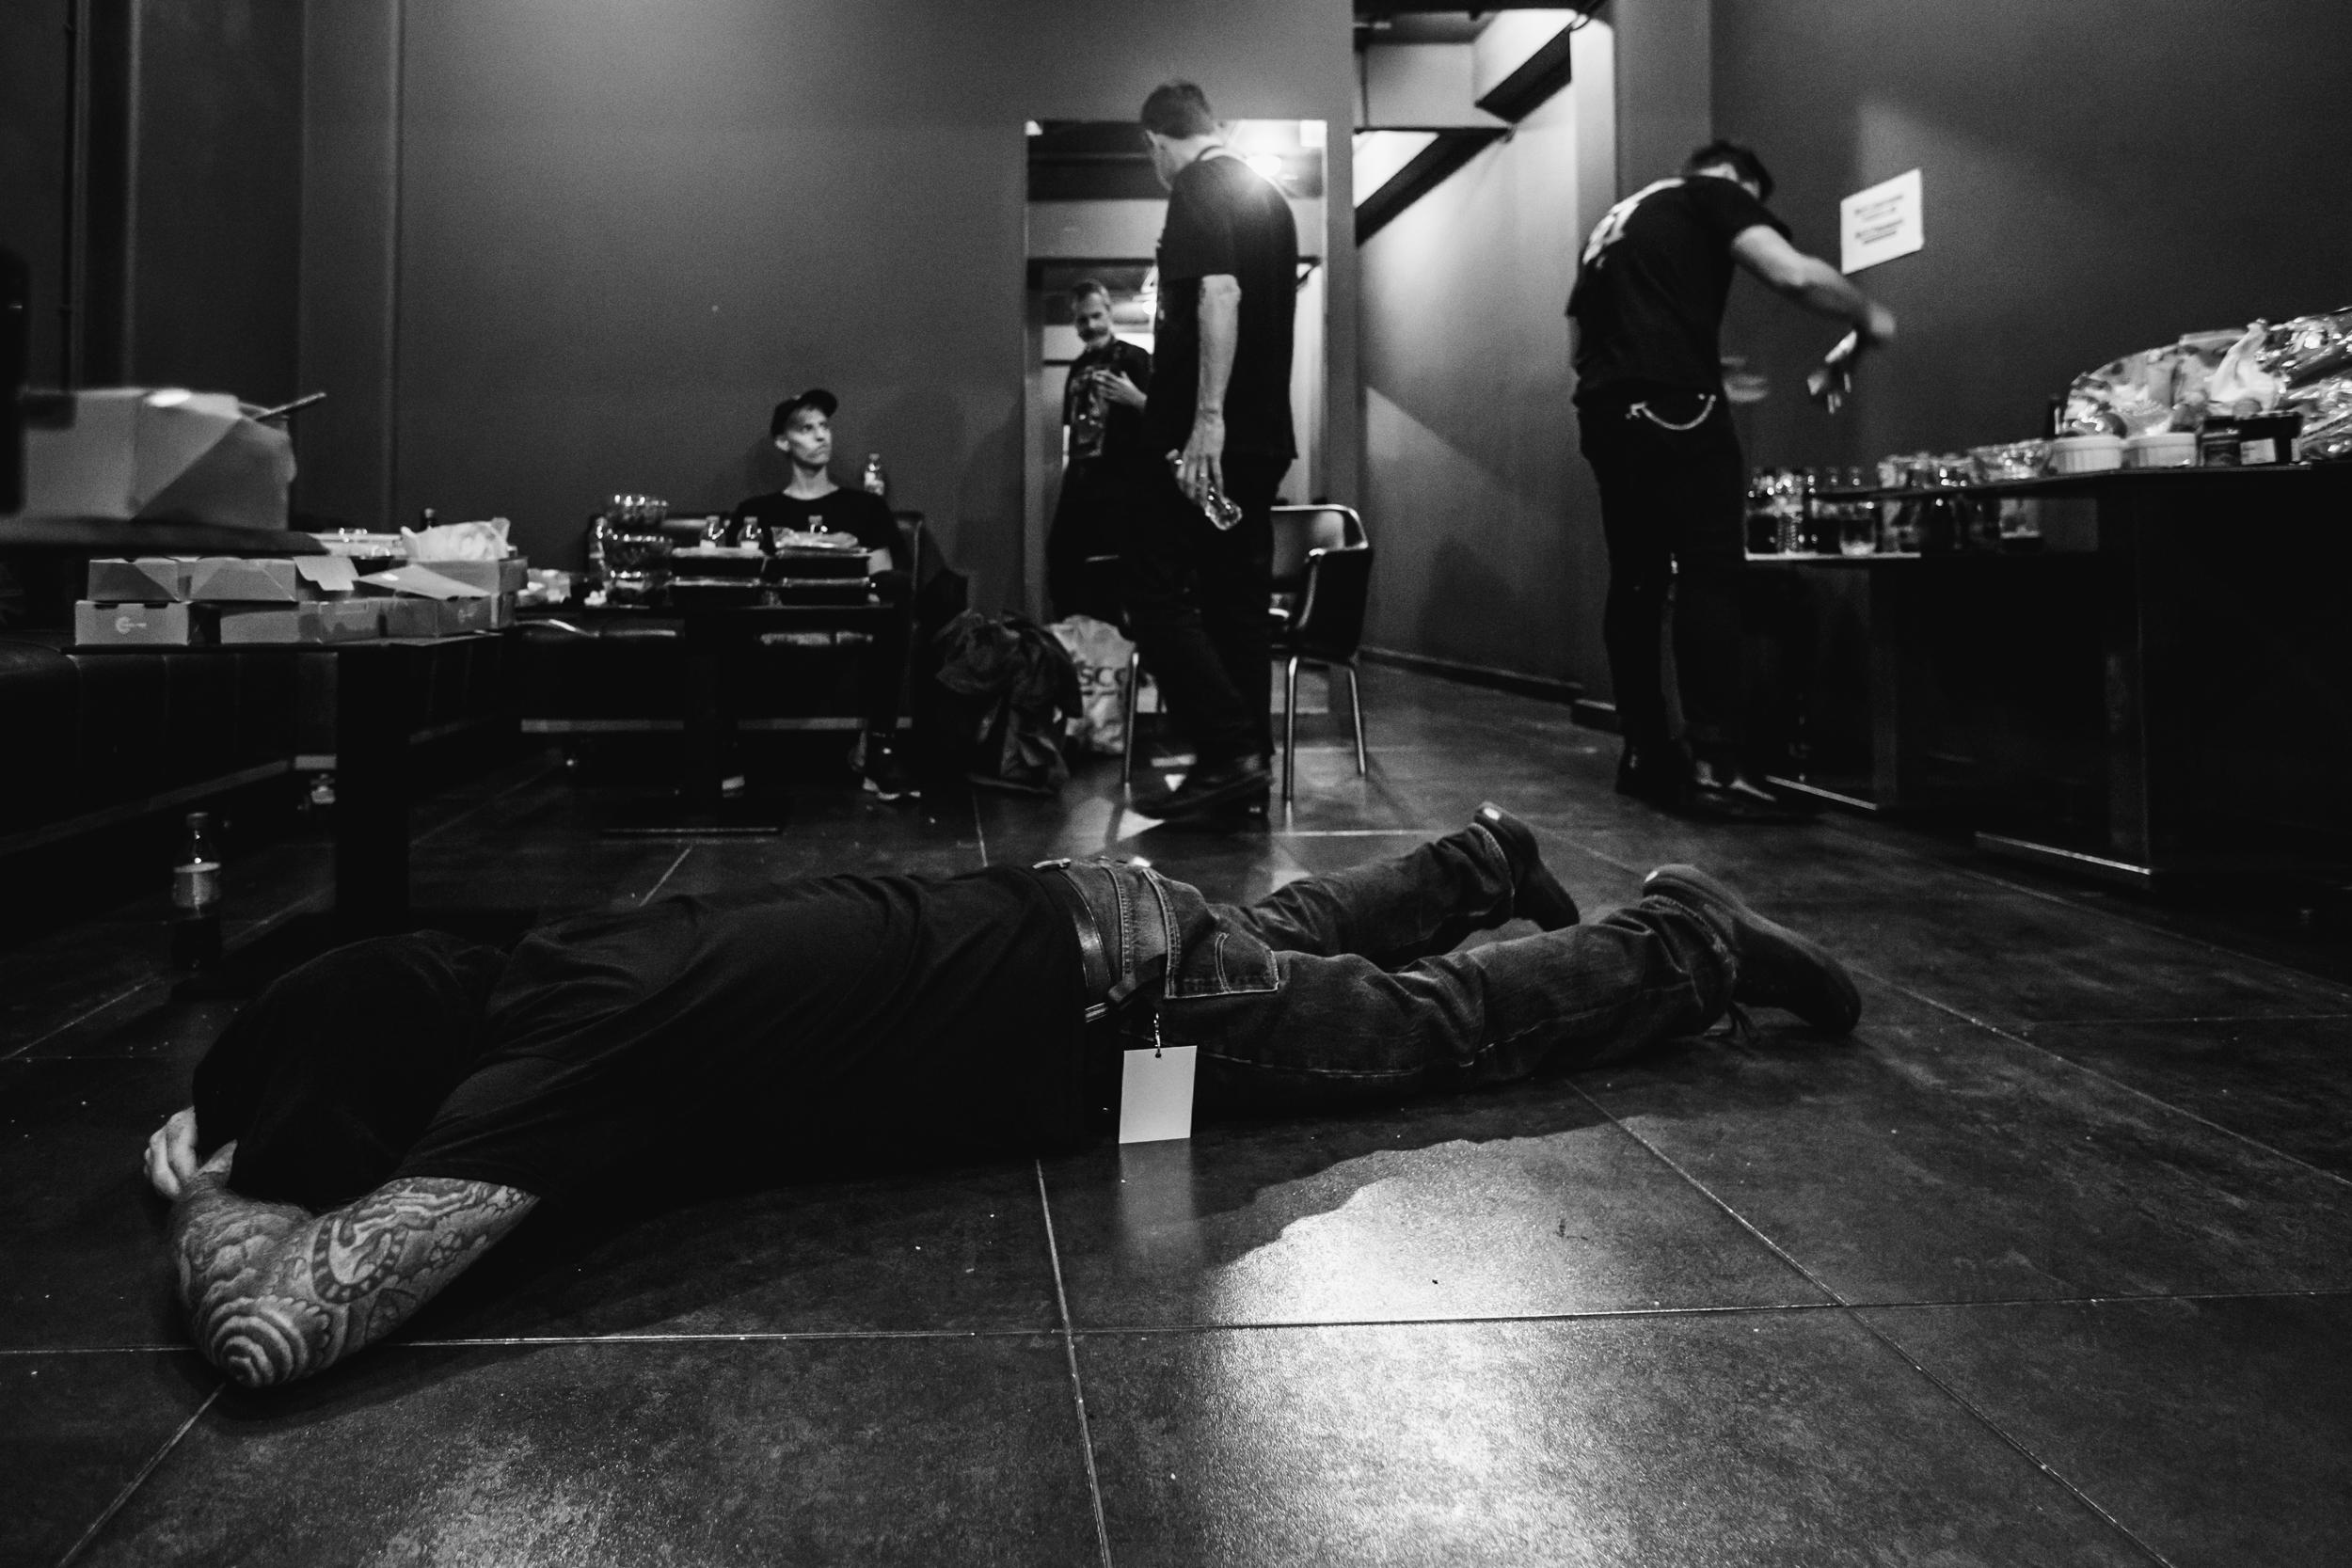 Backstage vibes